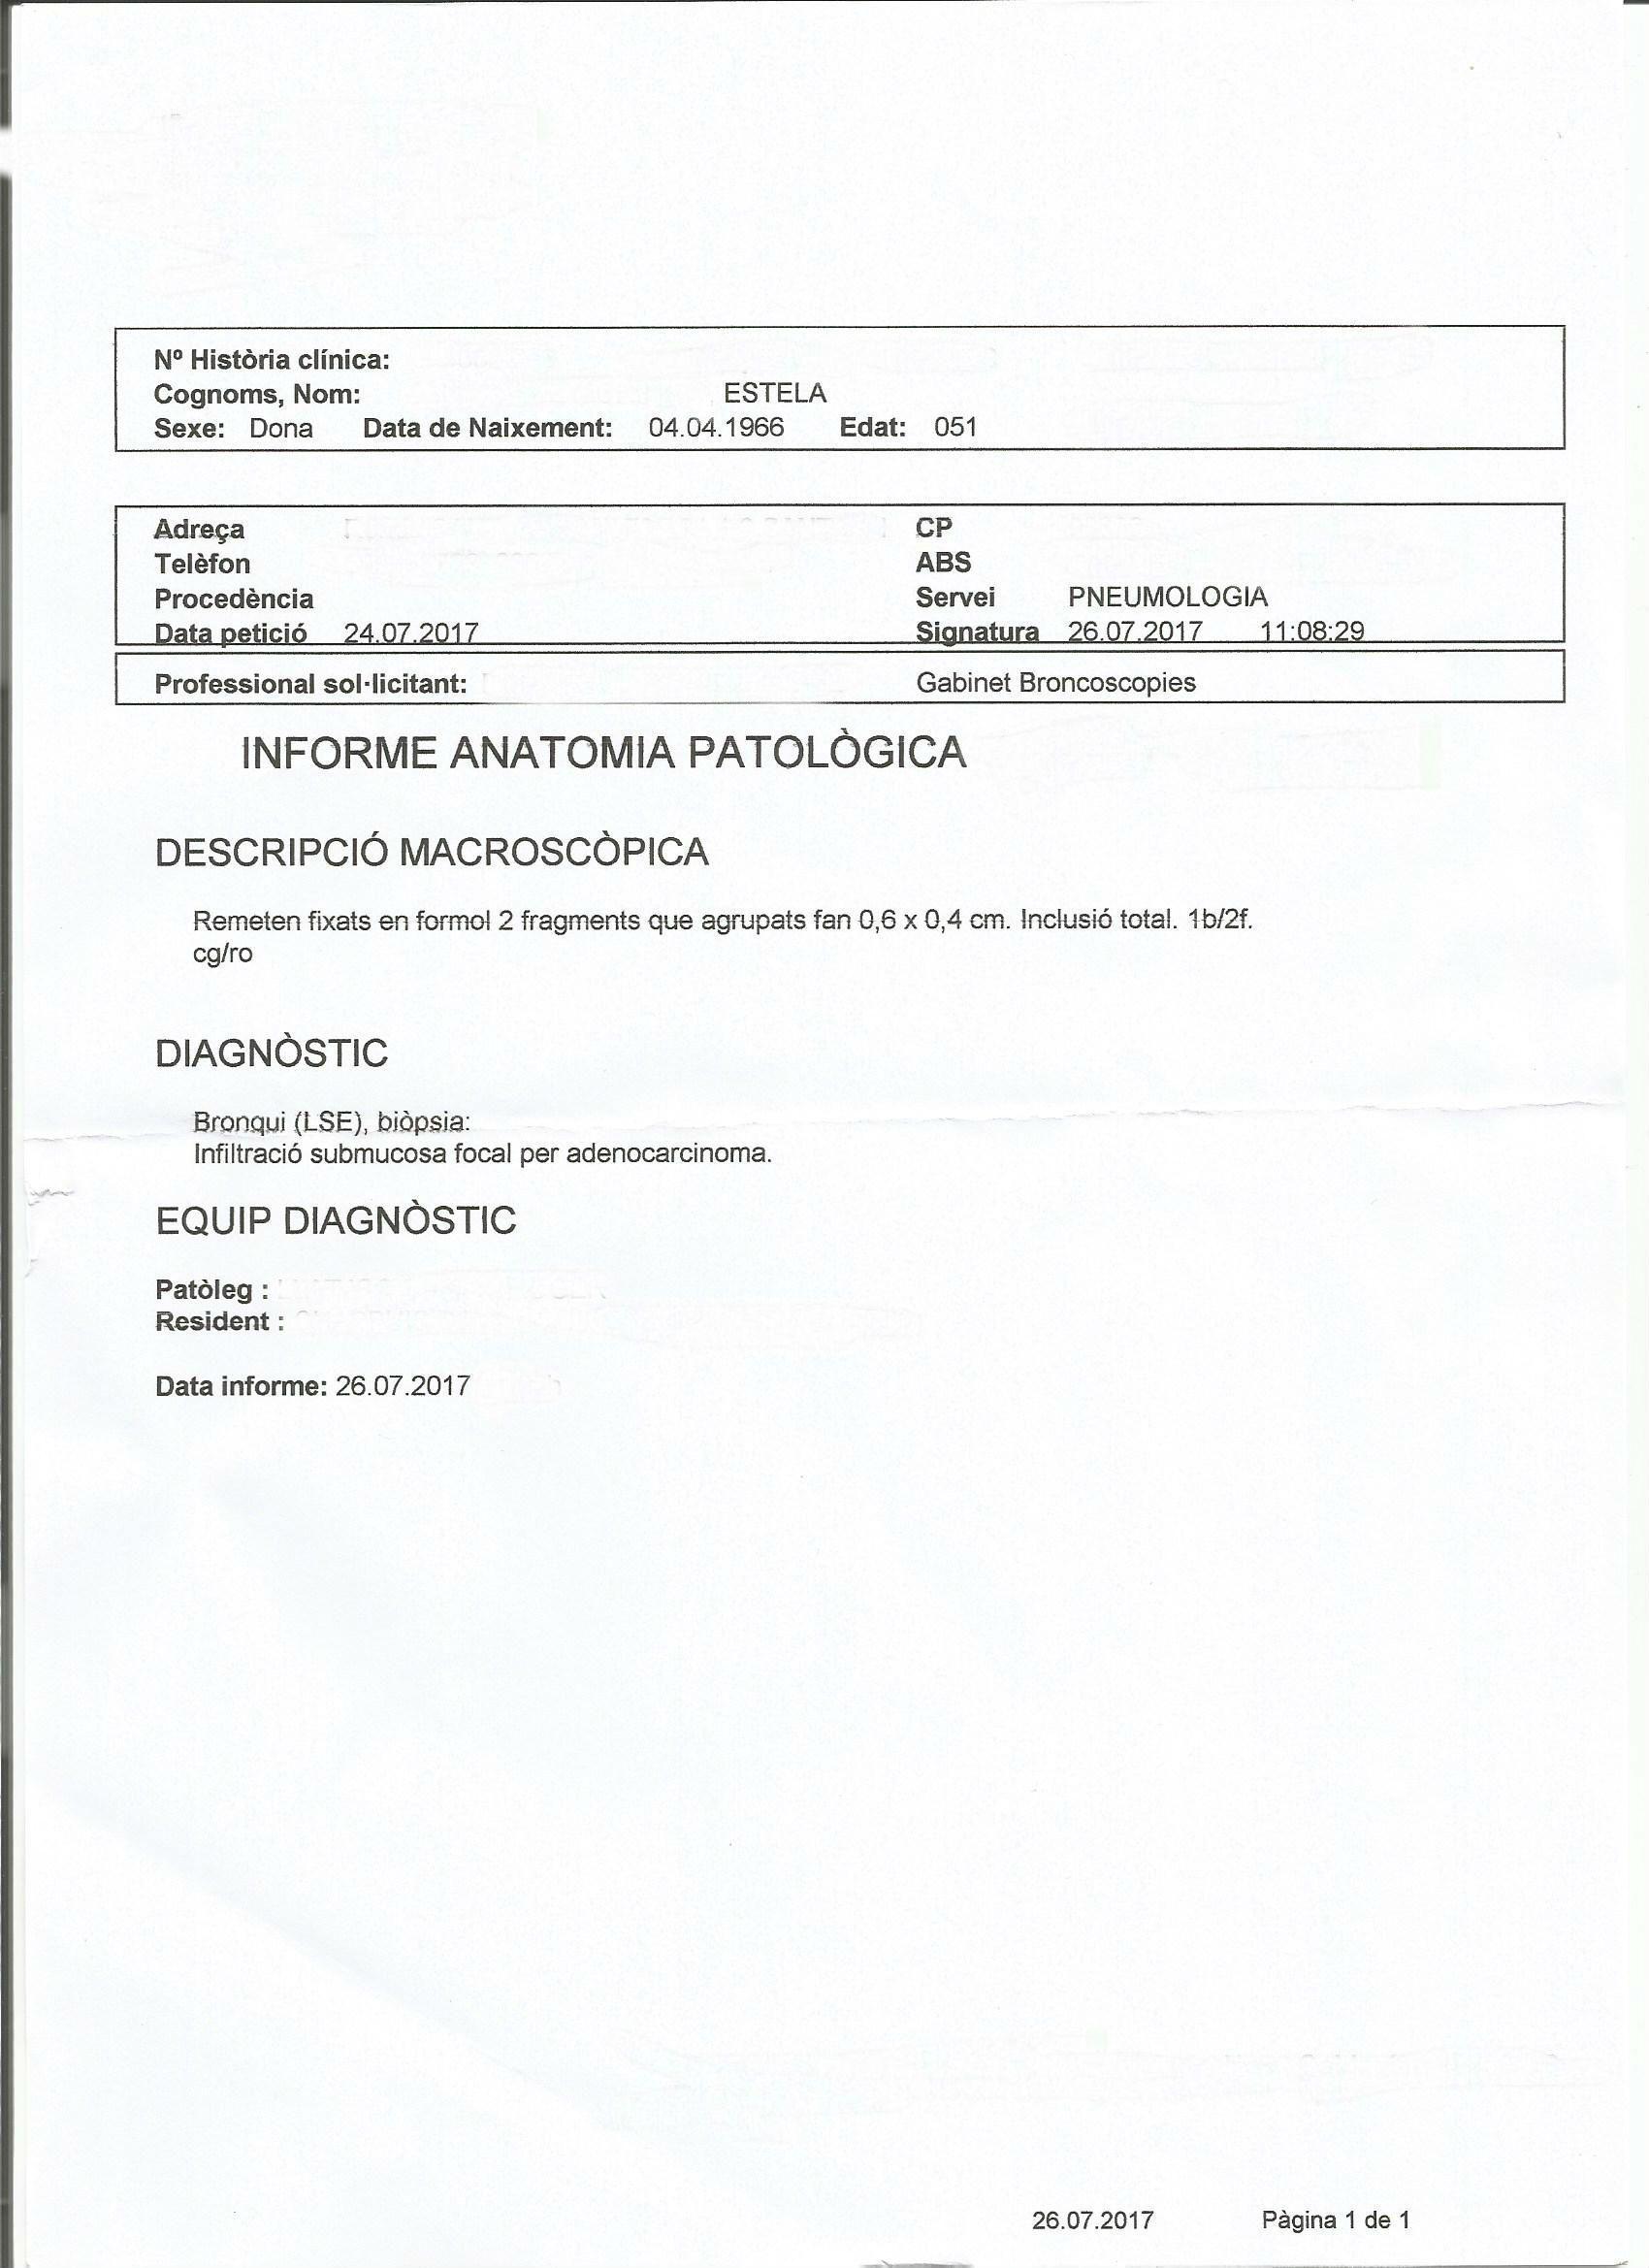 LifEscozul® - Estela 5 - Cáncer de Pulmon